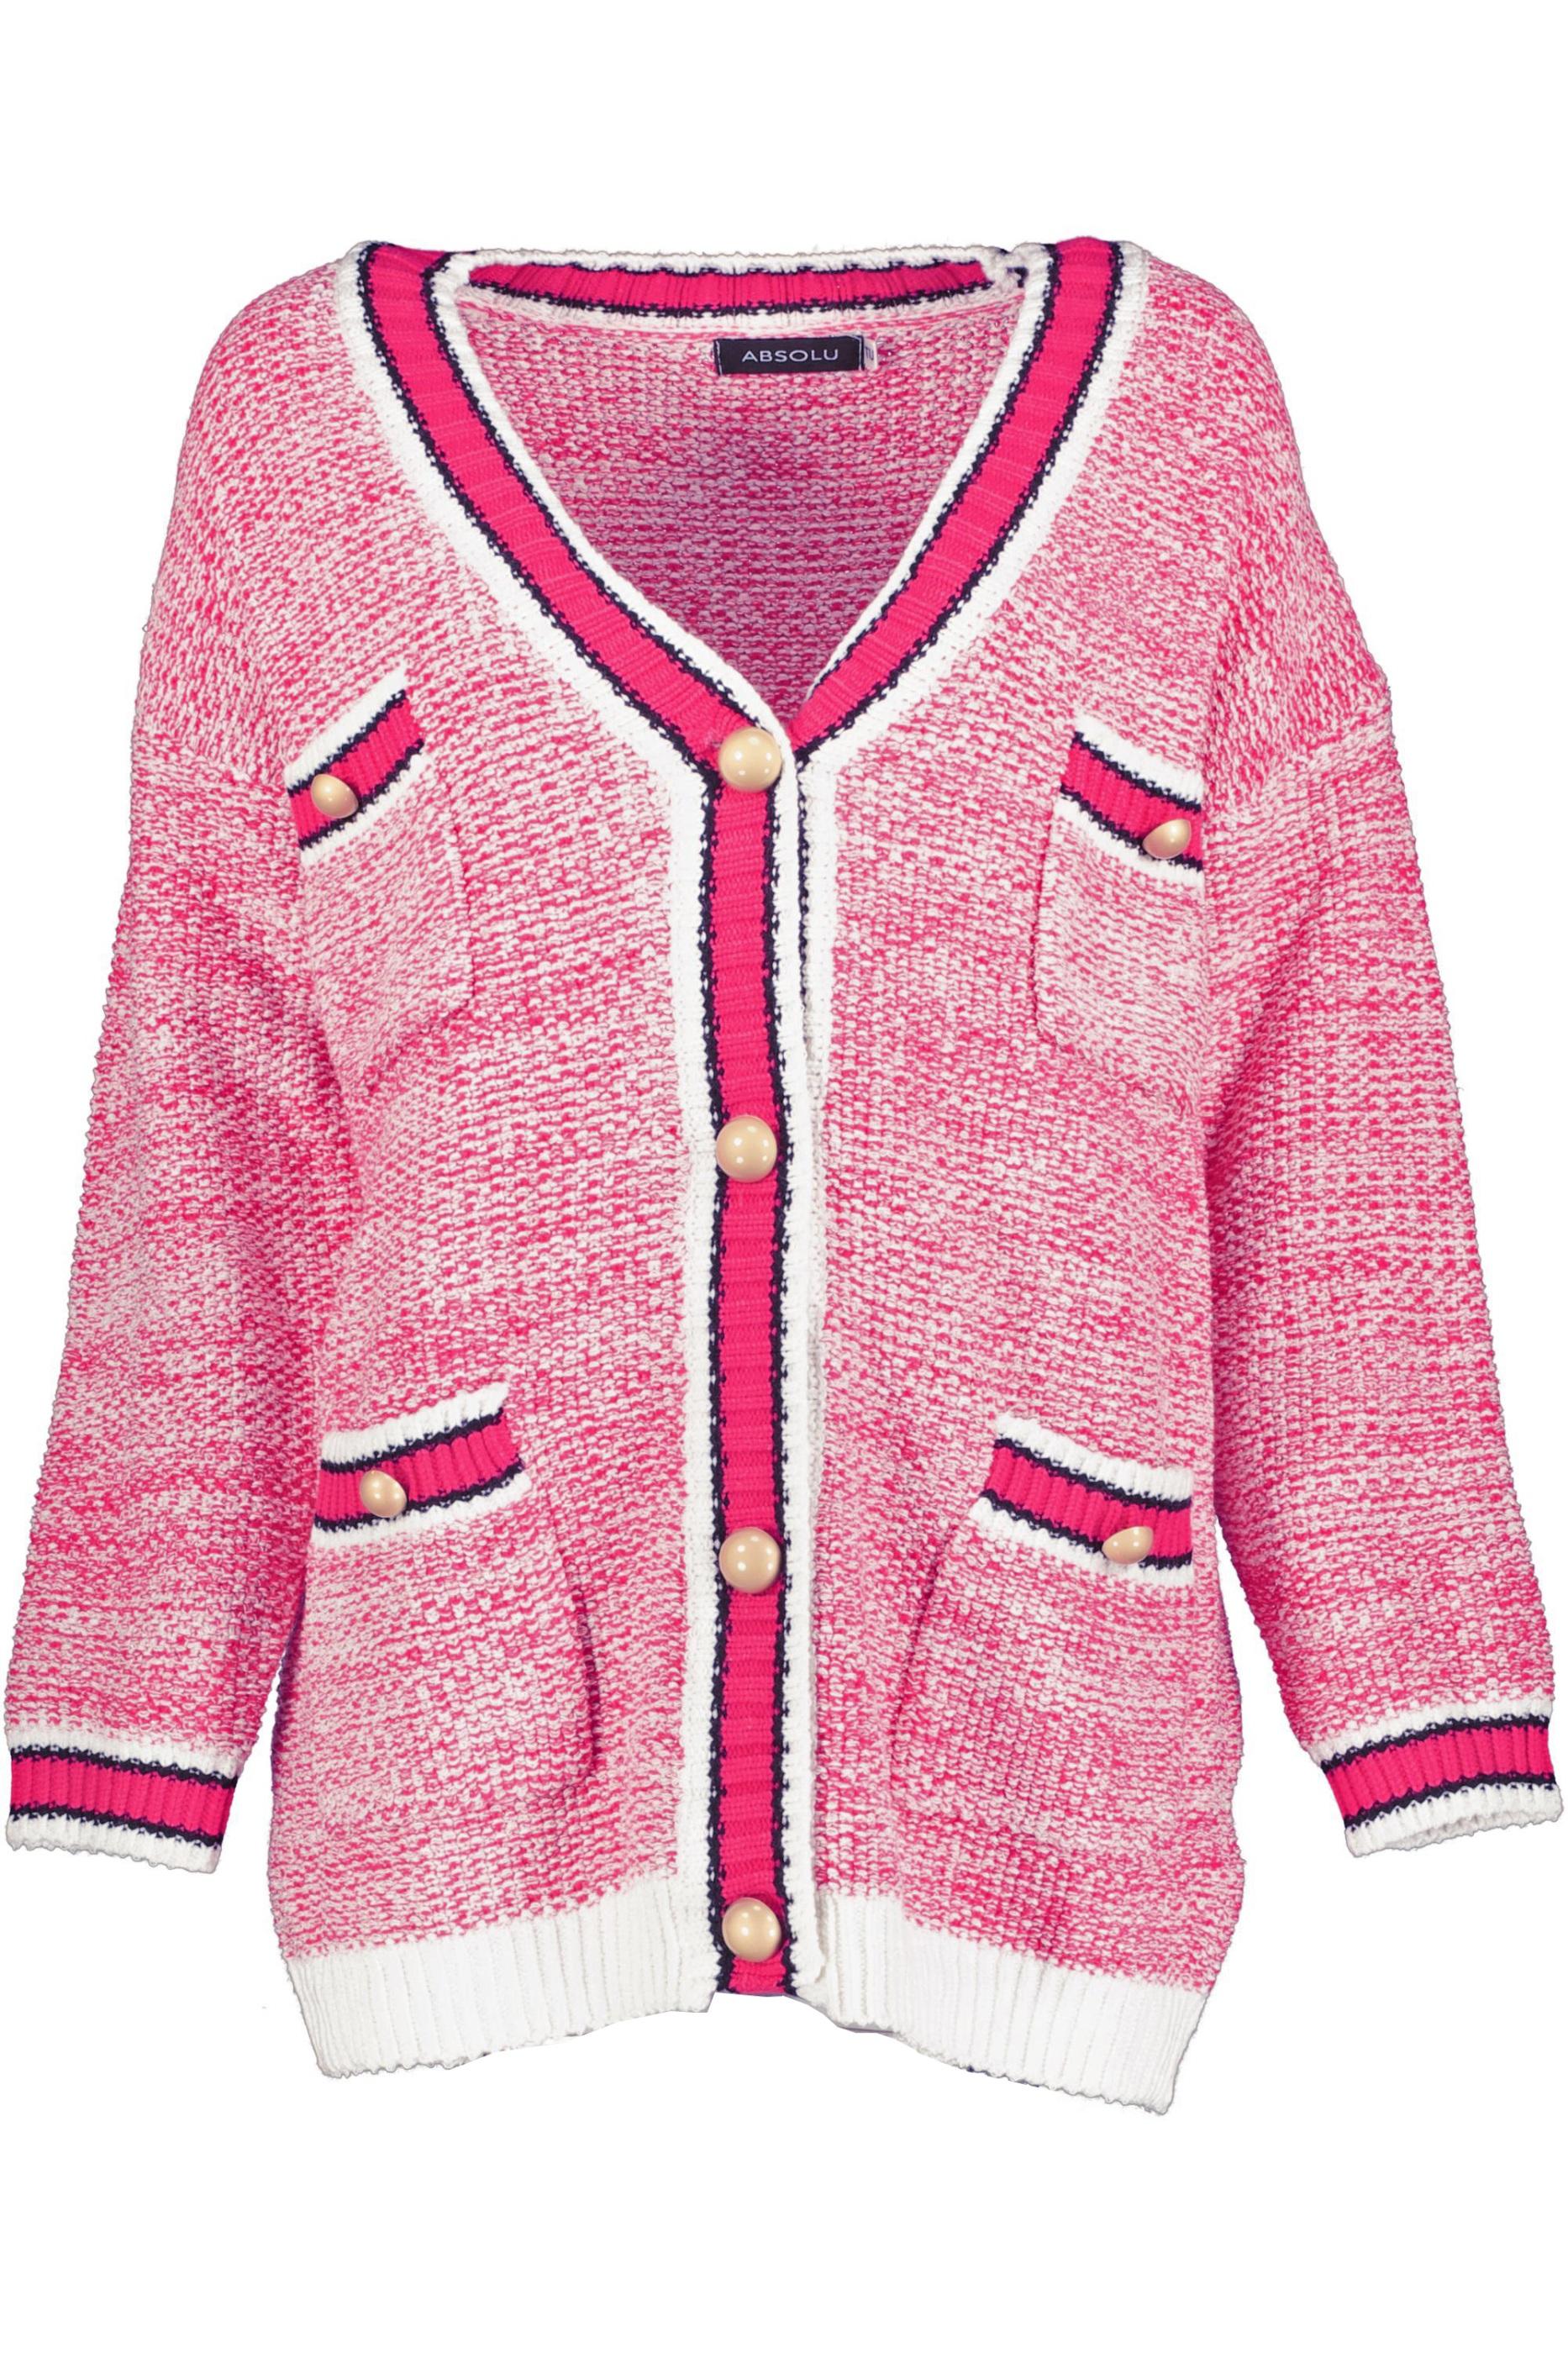 pink cardigan _Front+1_M2000x3000JPG